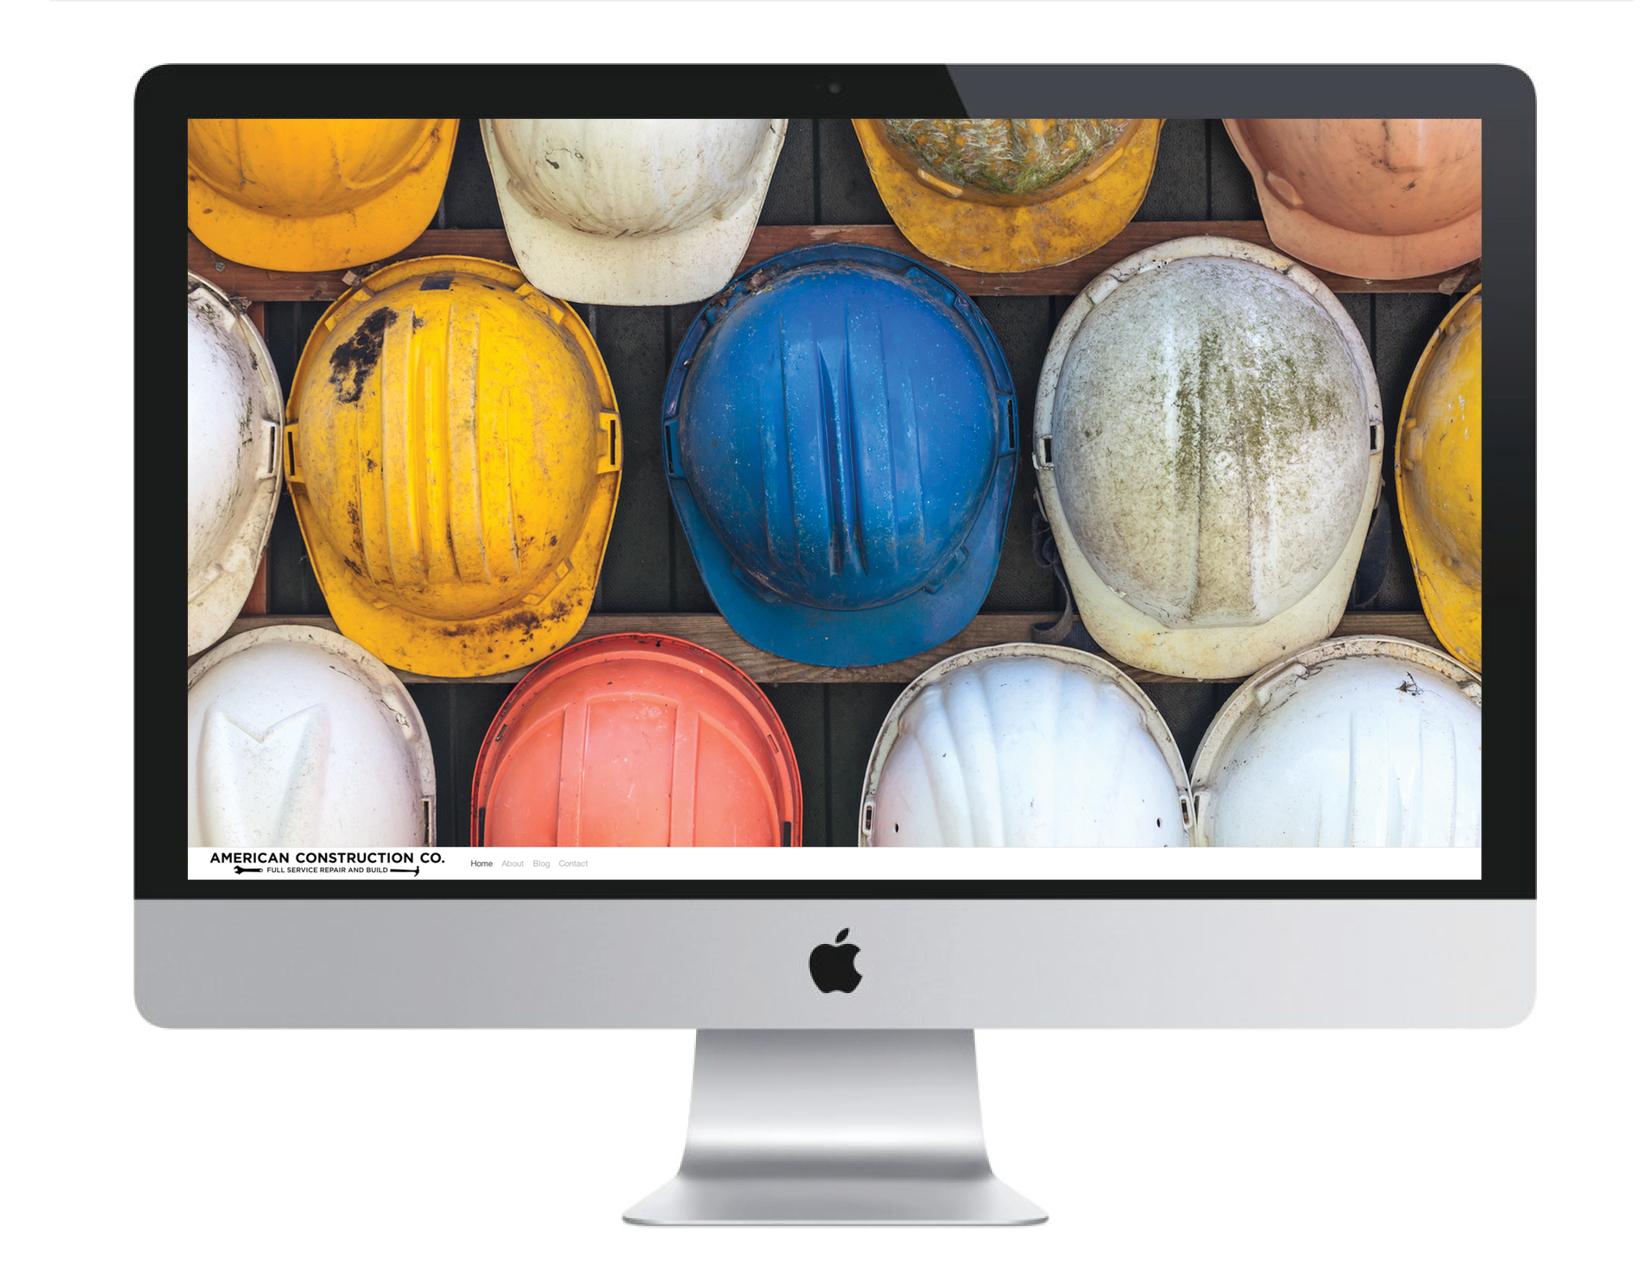 American Construction Co.jpg